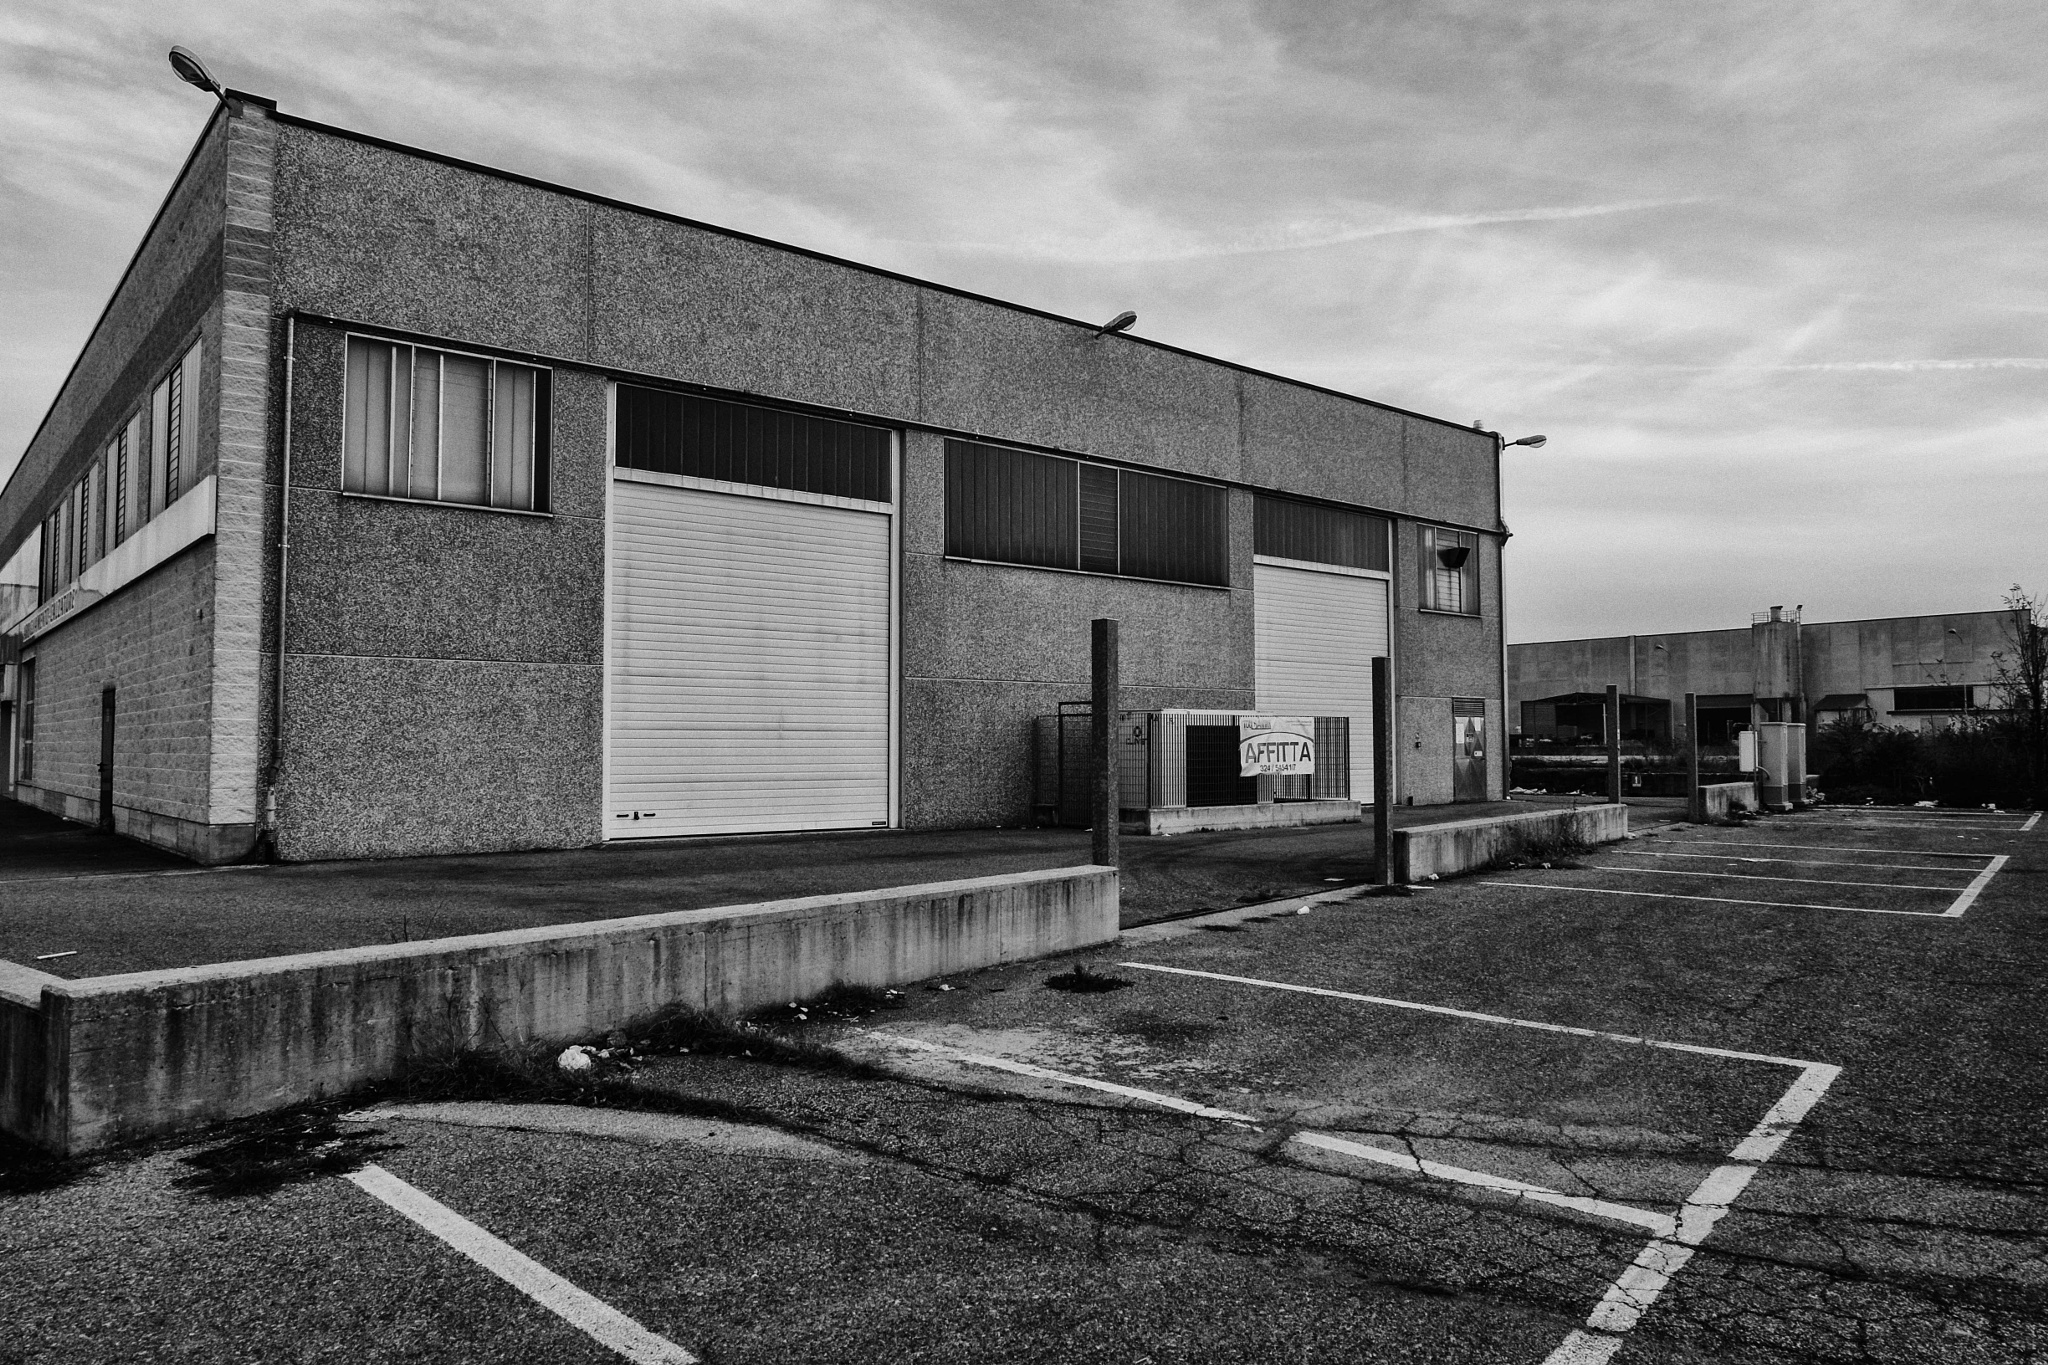 Industrial Area by FrancescoPala